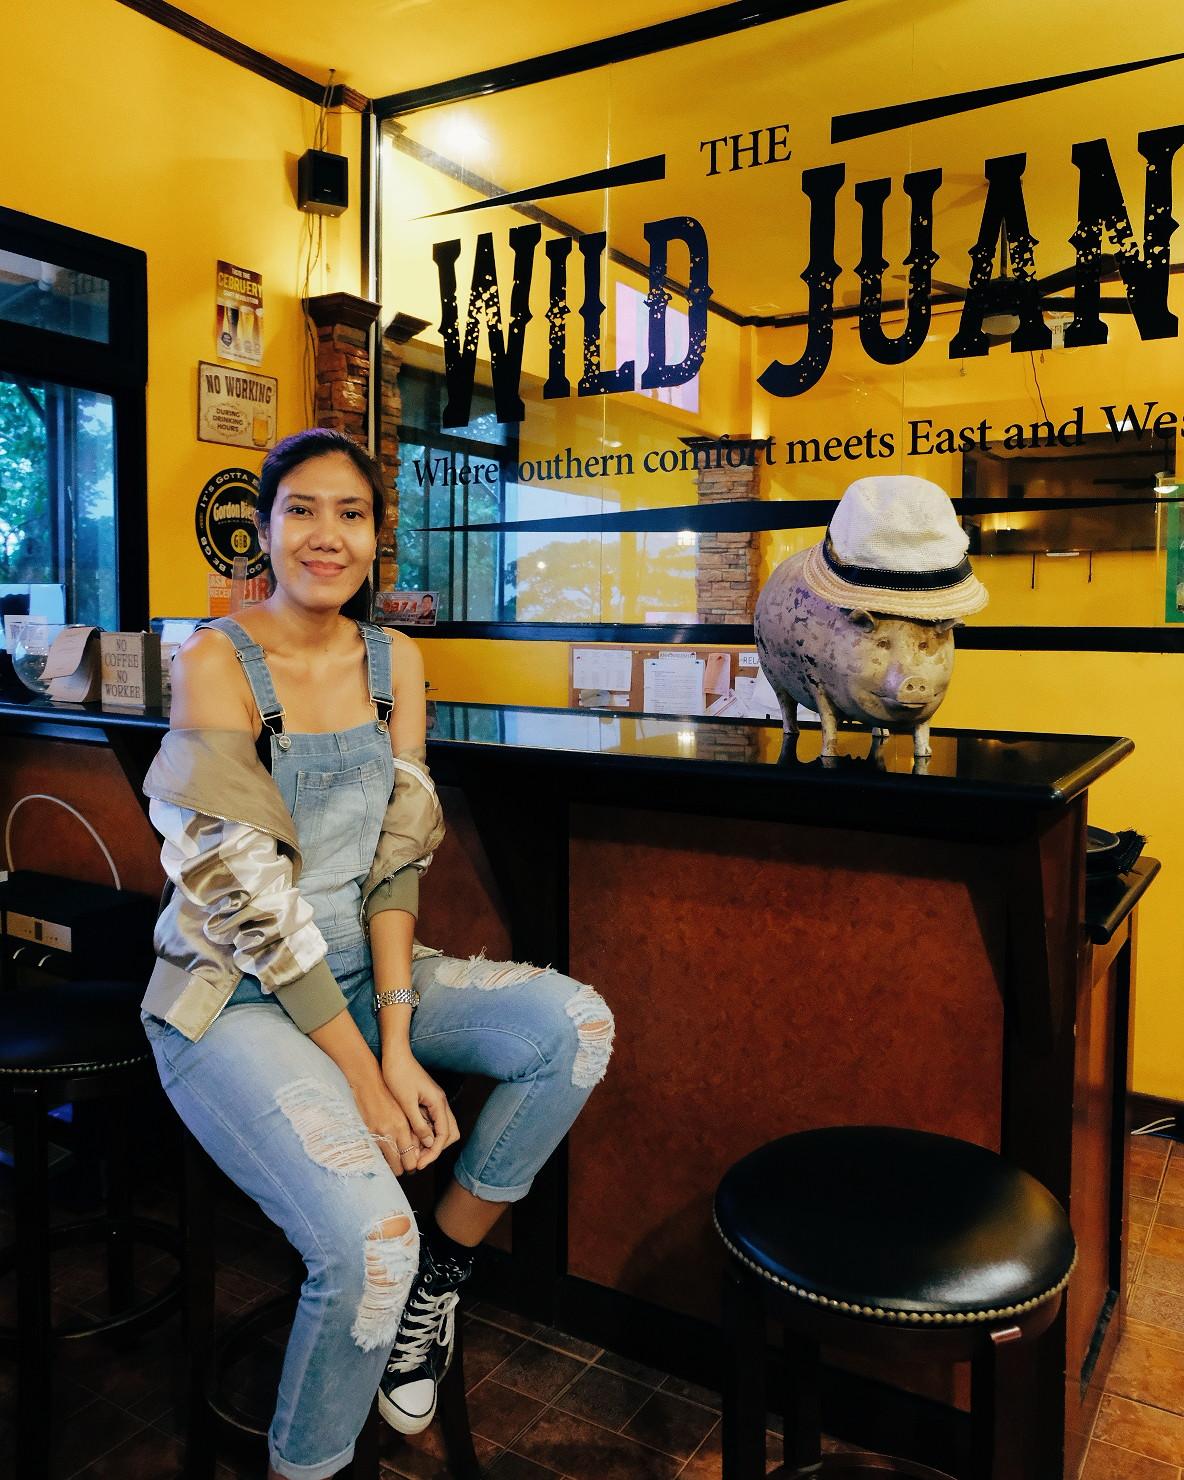 The Wild Juan Tagaytay